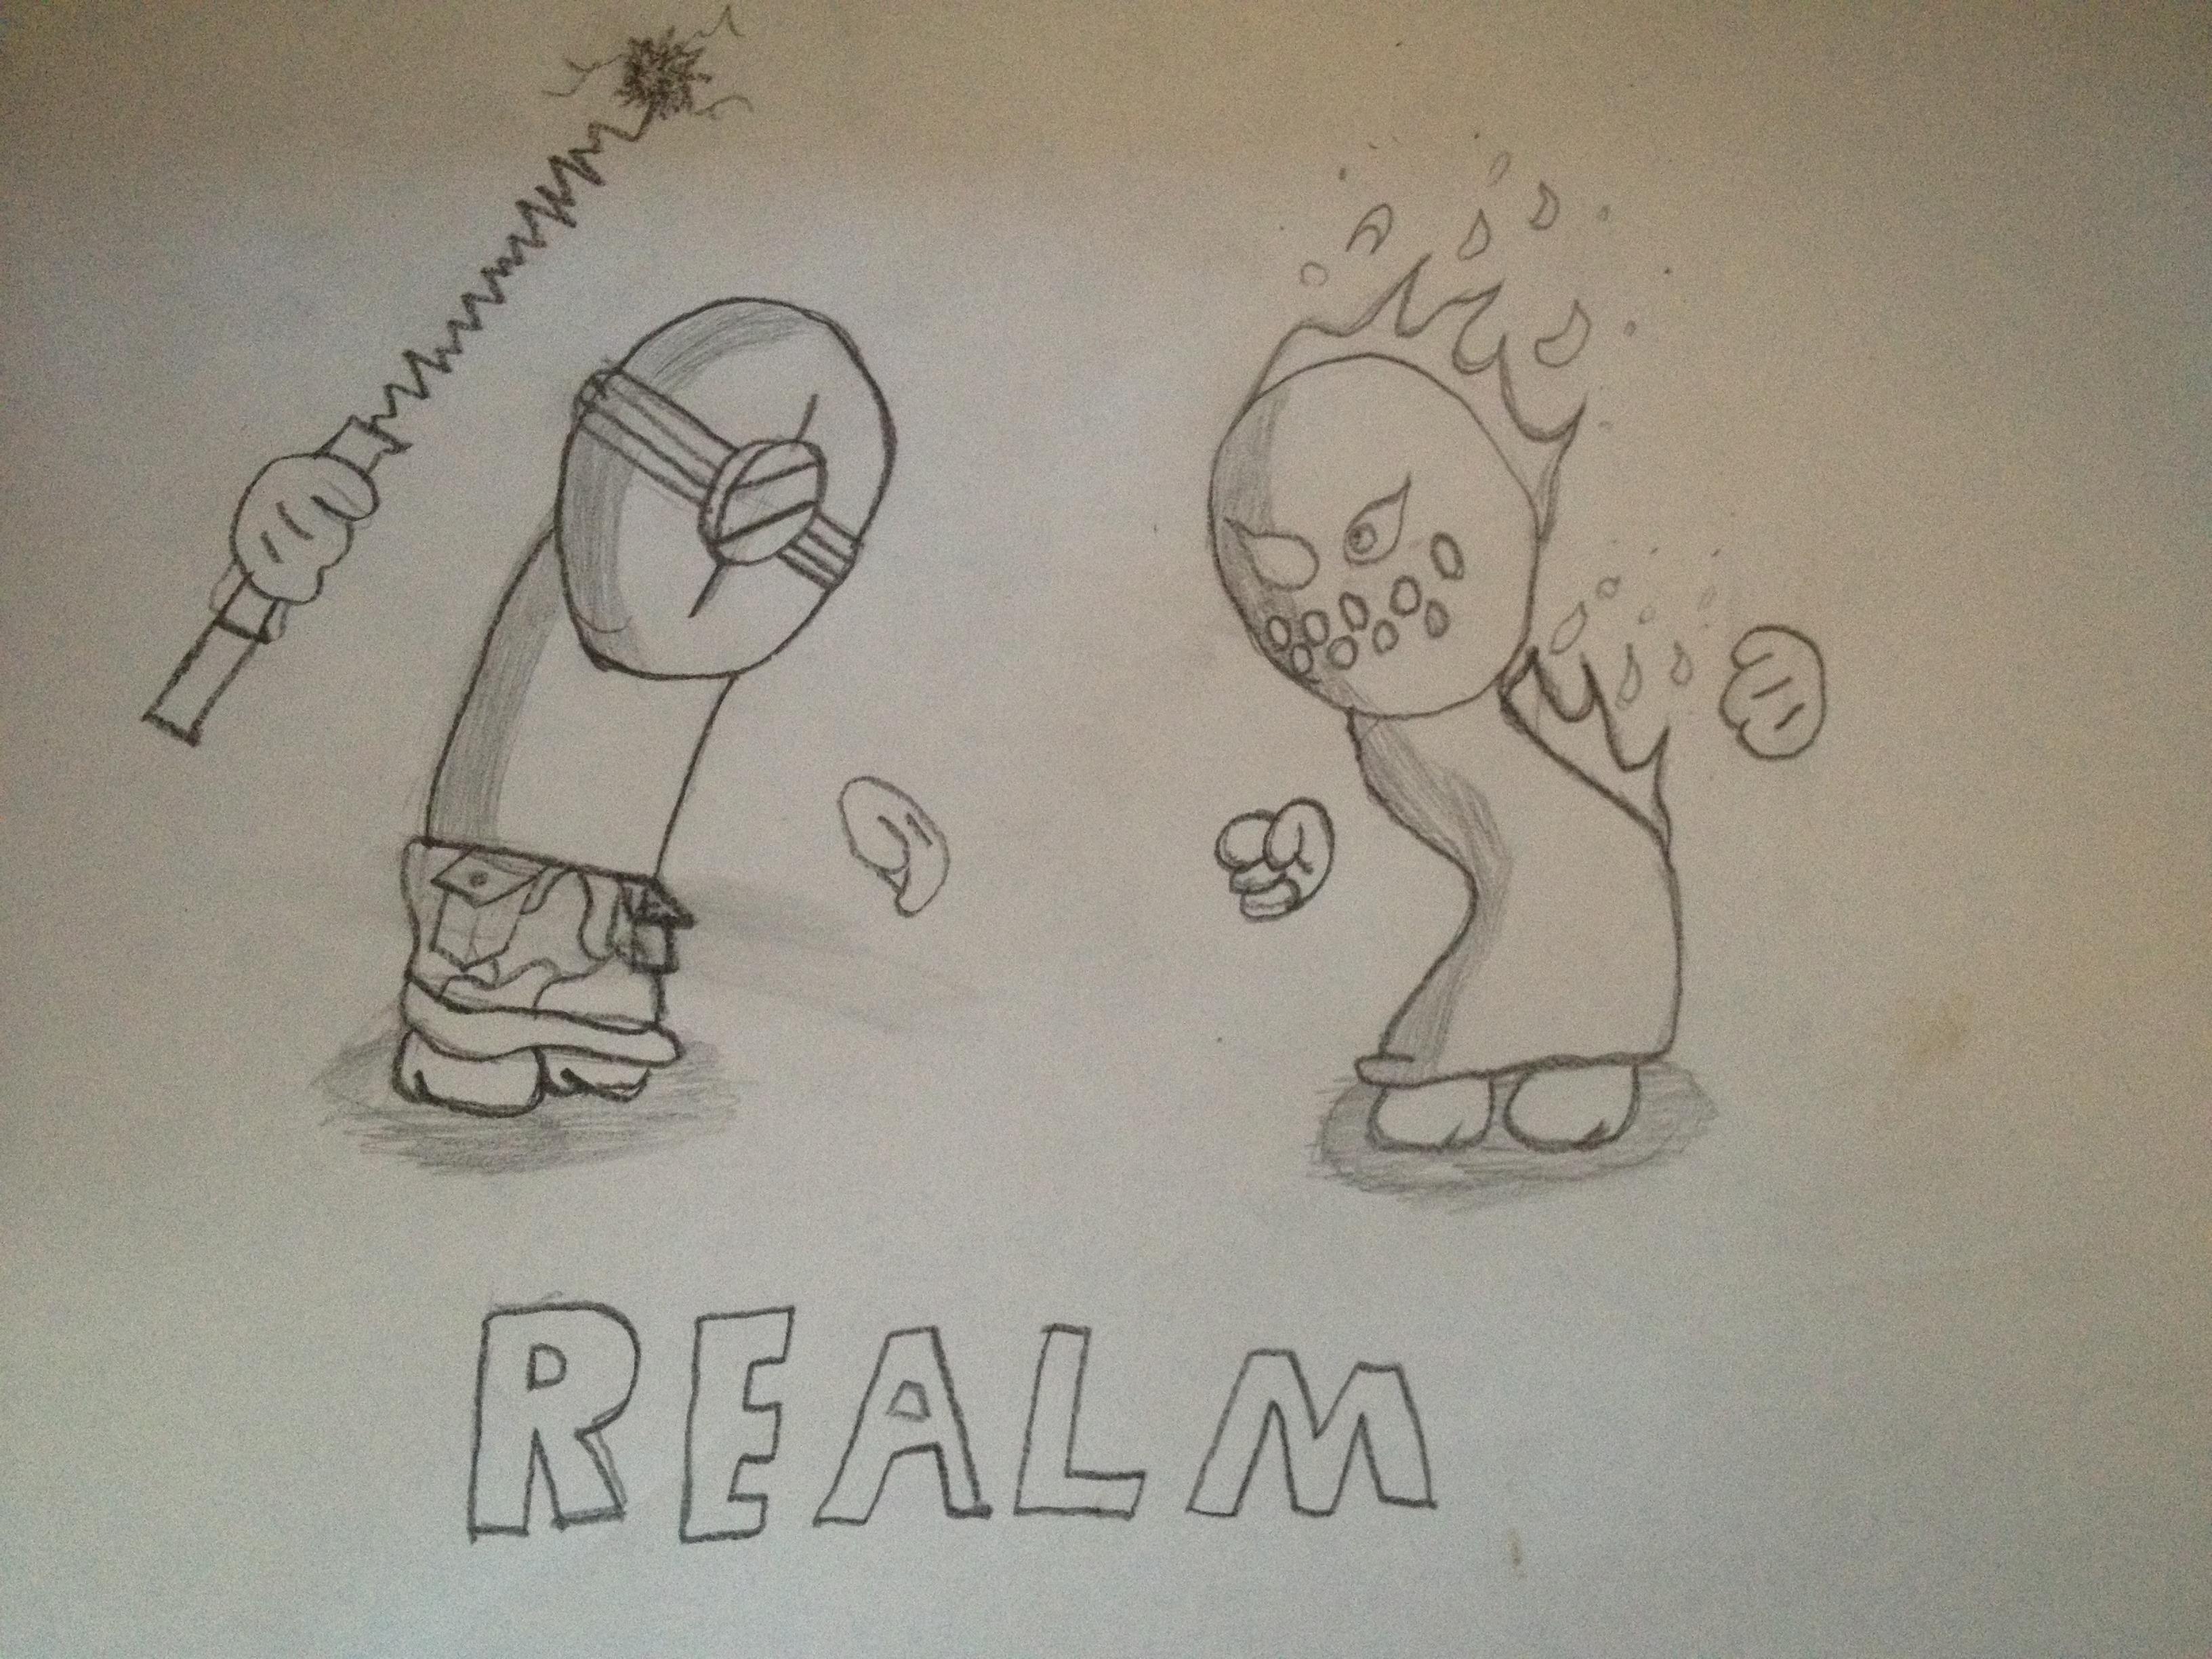 Realm sketch